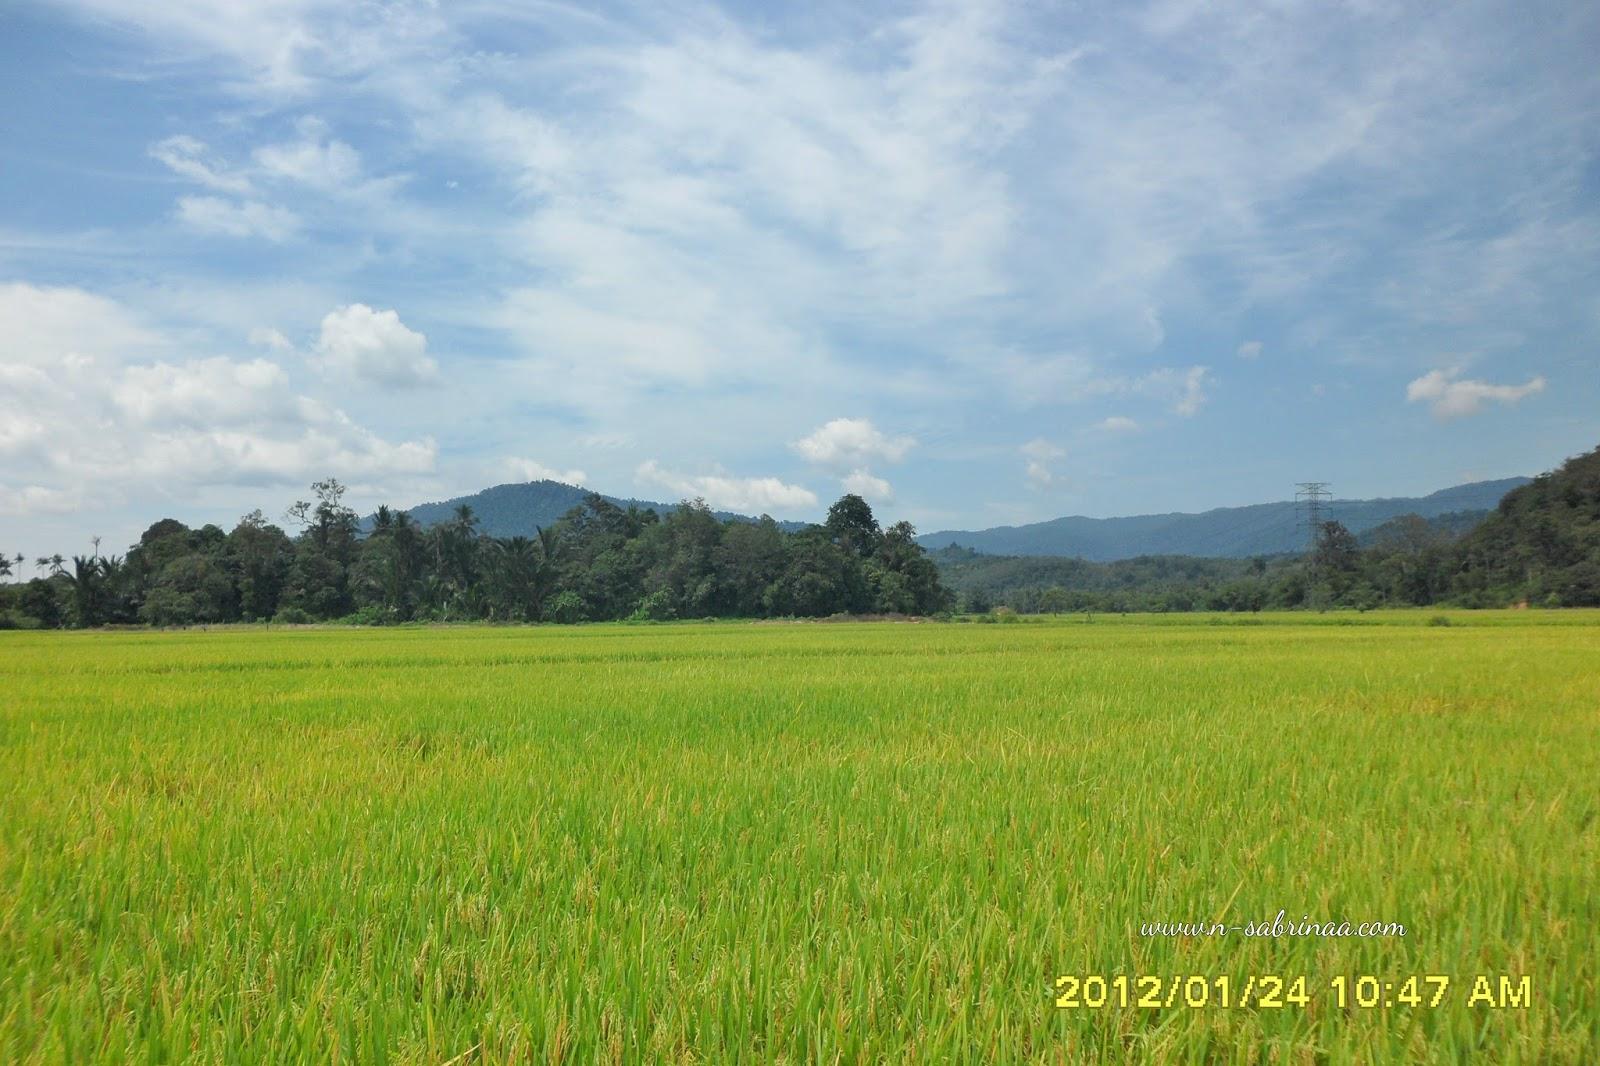 Pemandangan Sawah Padi Di Kuala Pilah Catatan Travel Sabrina